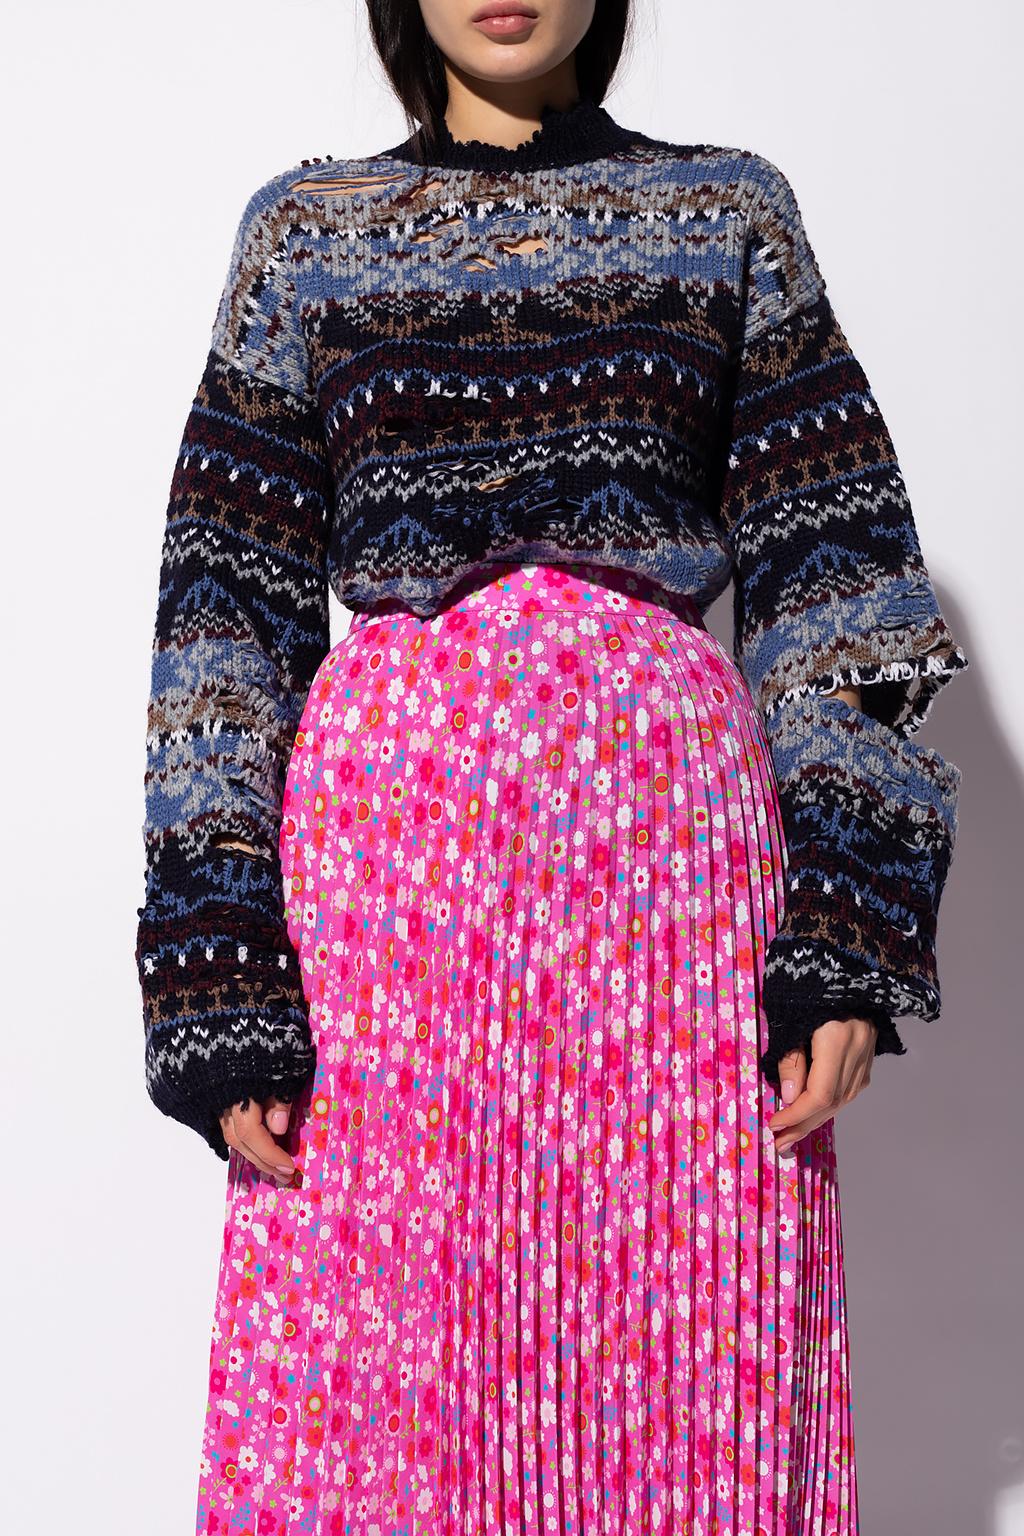 Balenciaga Patterned sweater